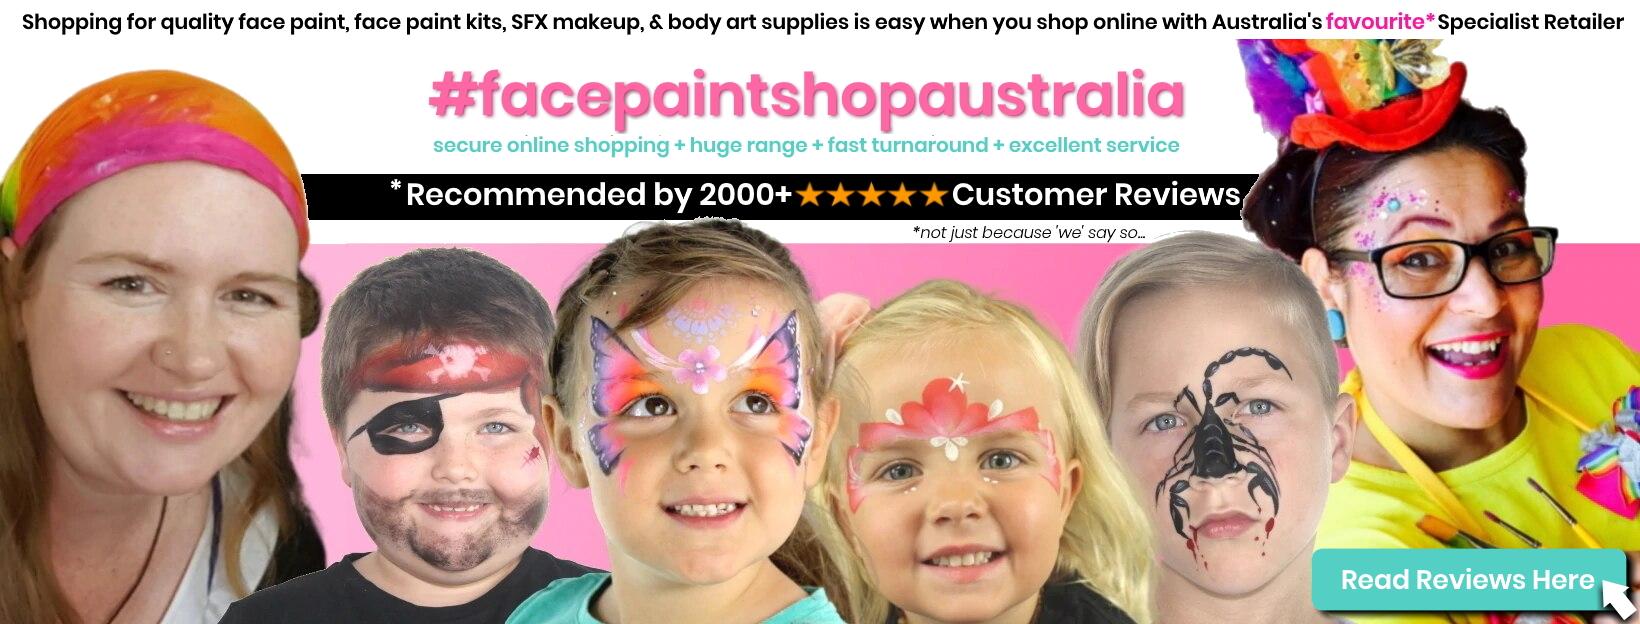 face paint shop australia home page customer reviews